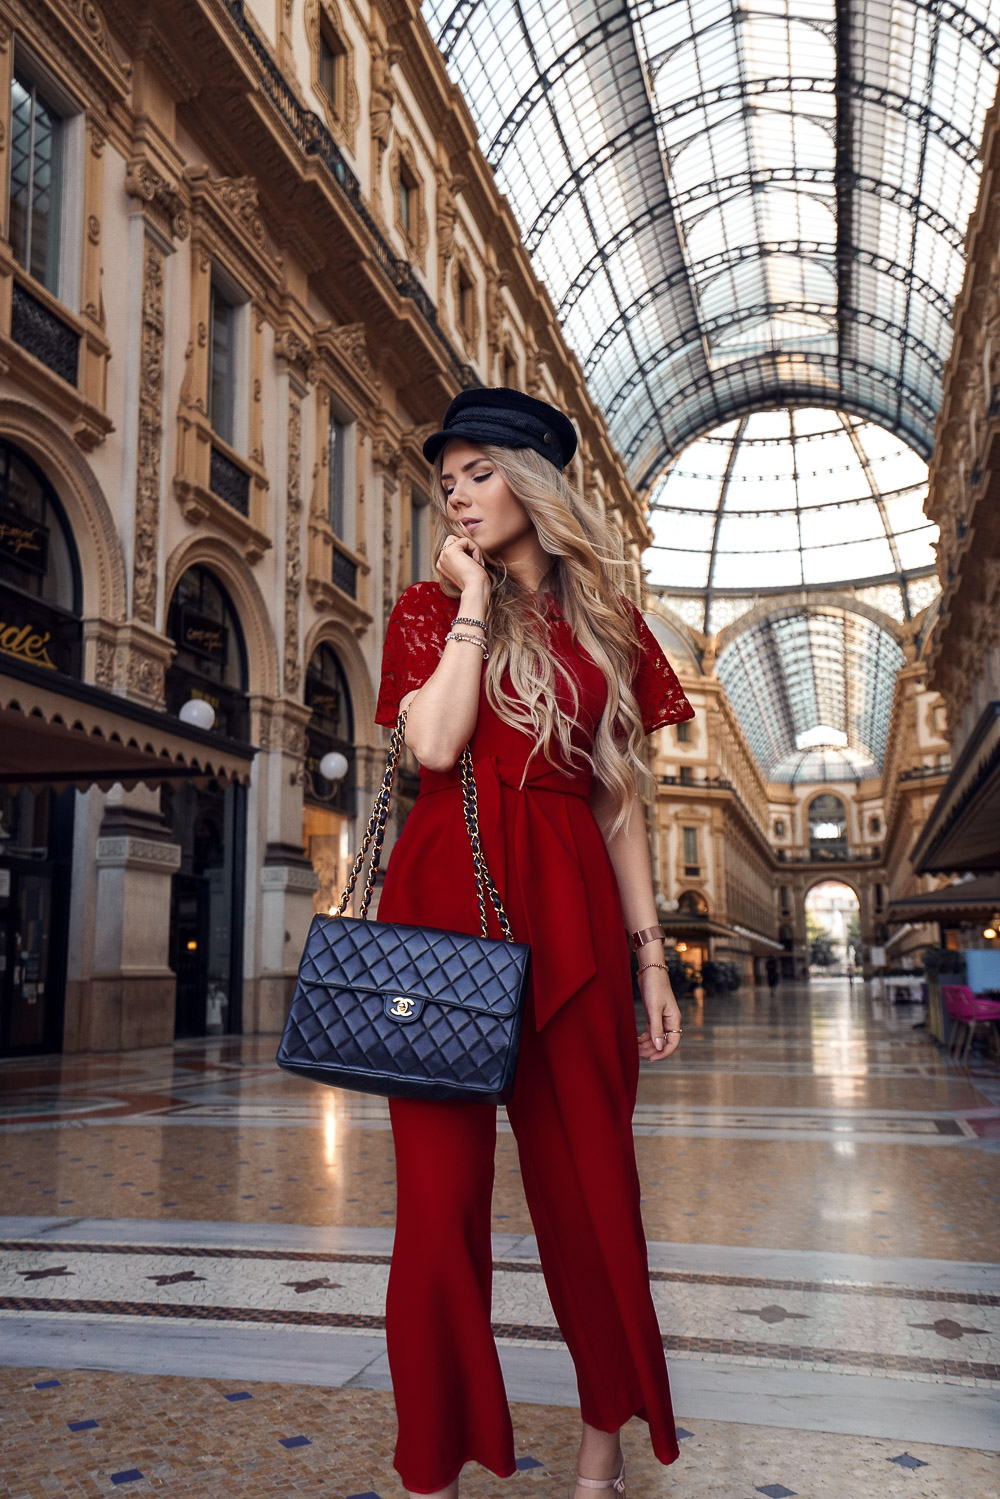 Roter Jumpsuit-Chanel Tasche-Baker Boy-Mailand